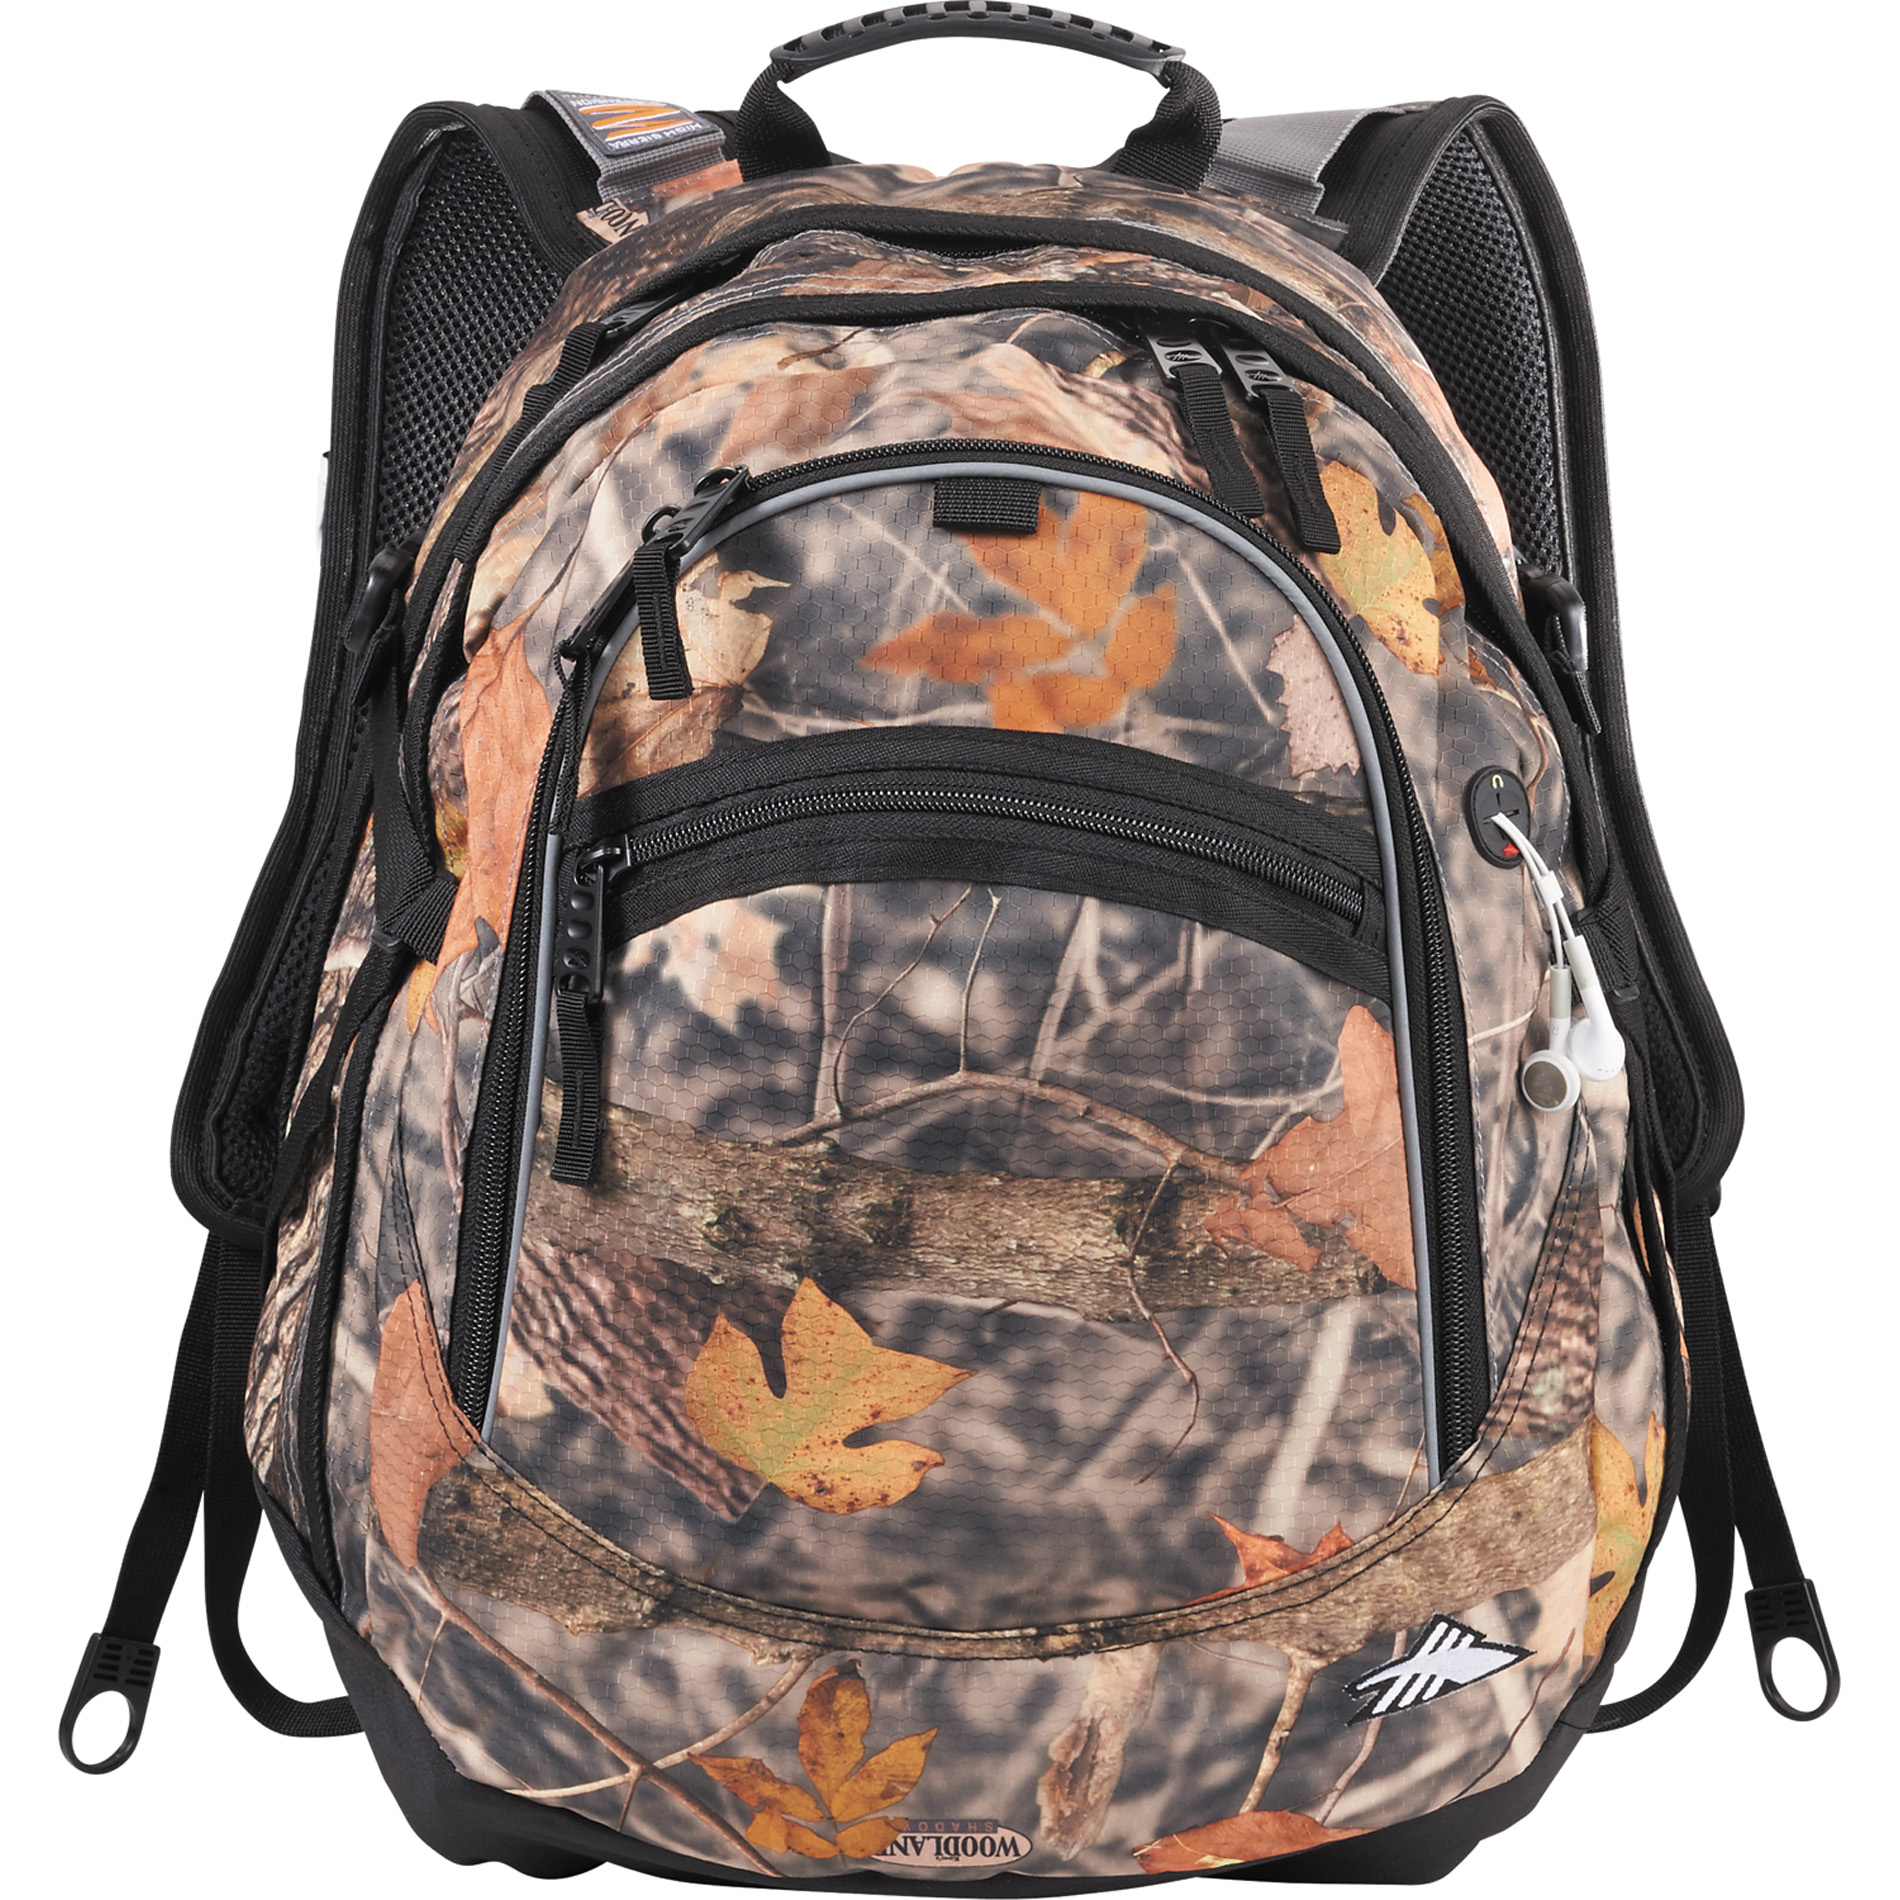 High Sierra 8050-95 - Fat-Boy Backpack